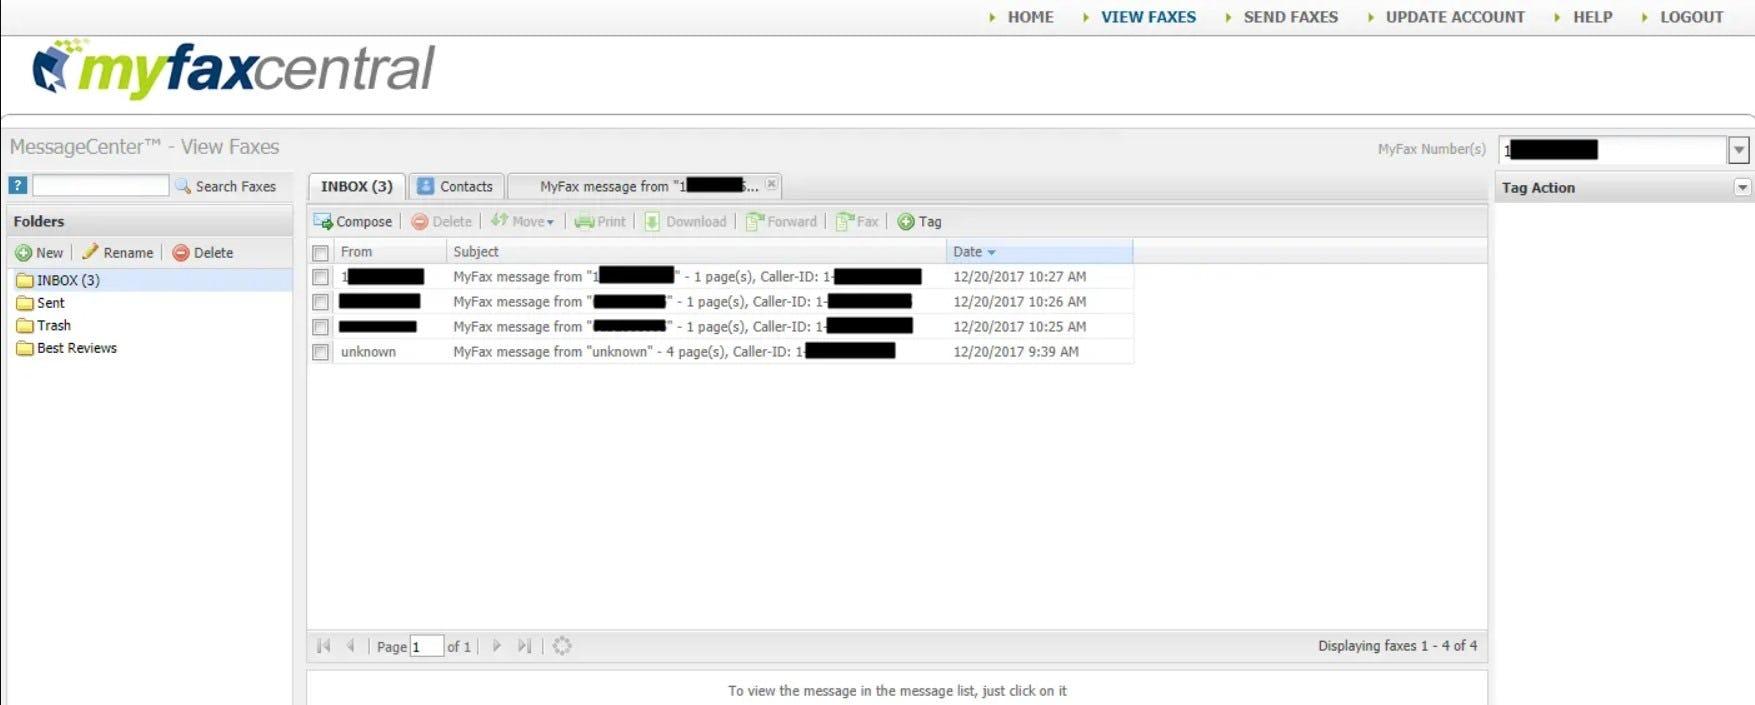 MyFax Software - MyFax fax inbox